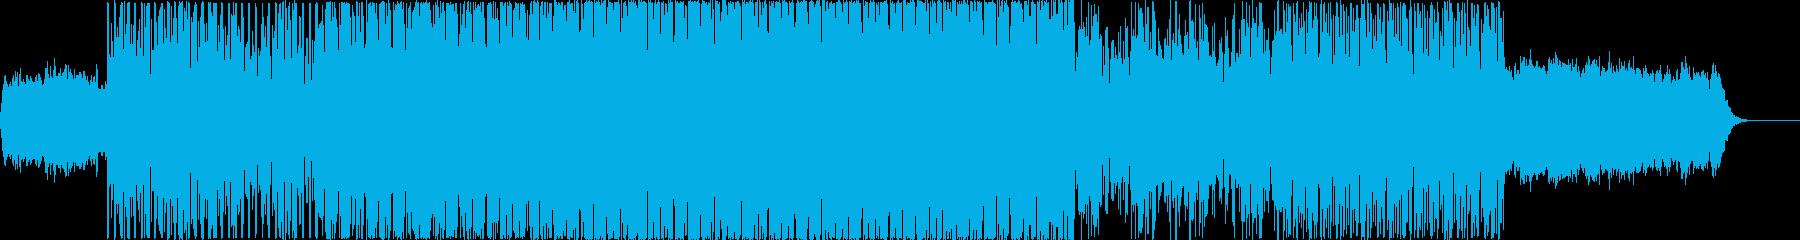 EDM系のミディアムなSynthwaveの再生済みの波形